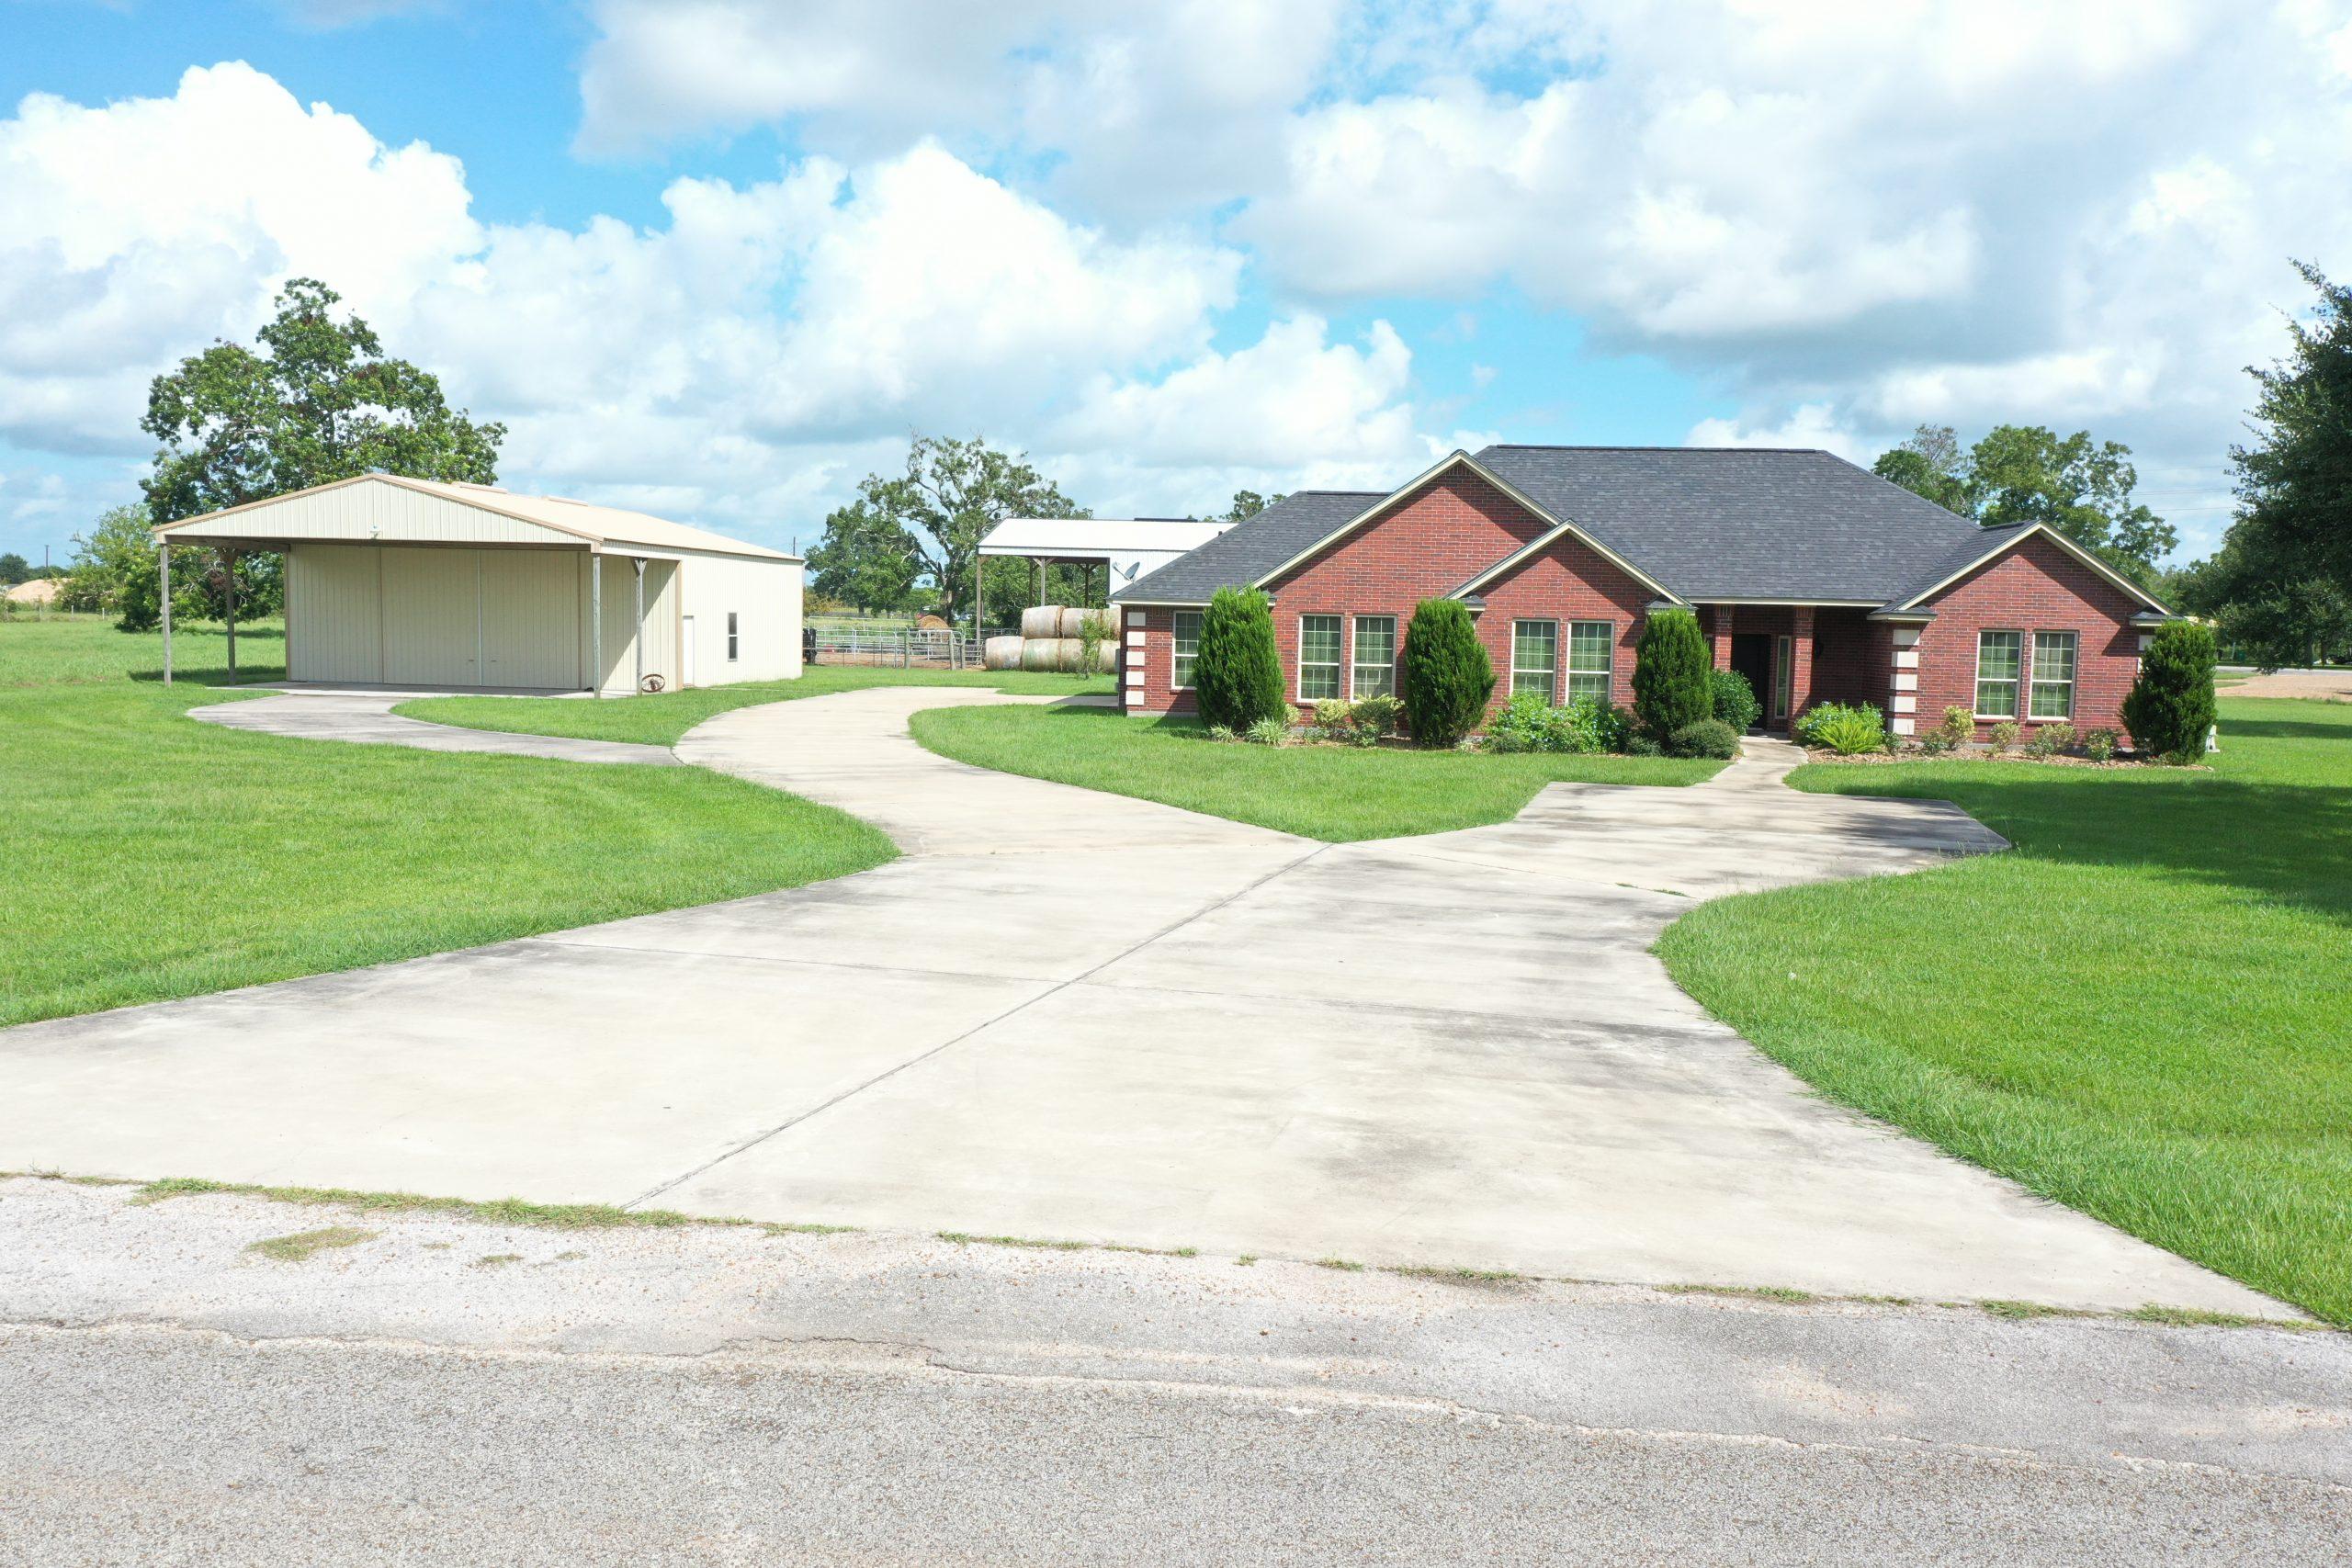 Custom built home on acreage in Wharton